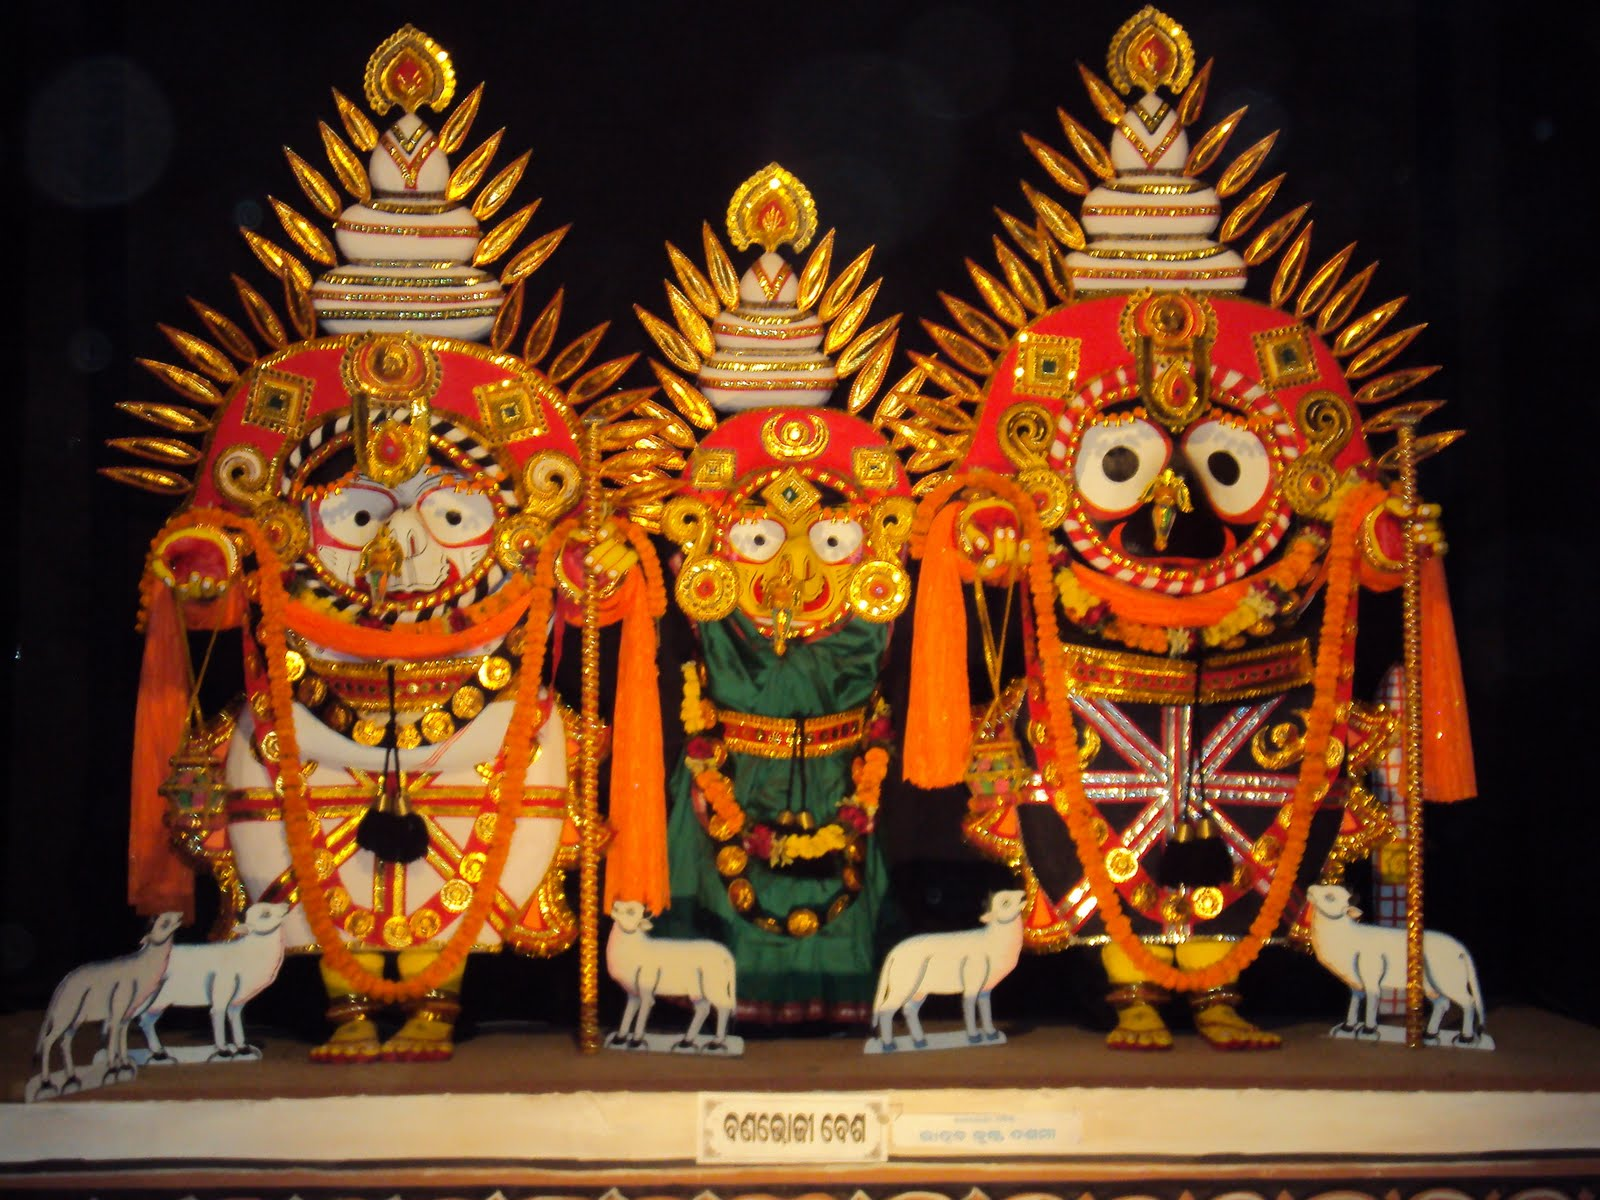 lord jagannath was called purusottama since his origin at